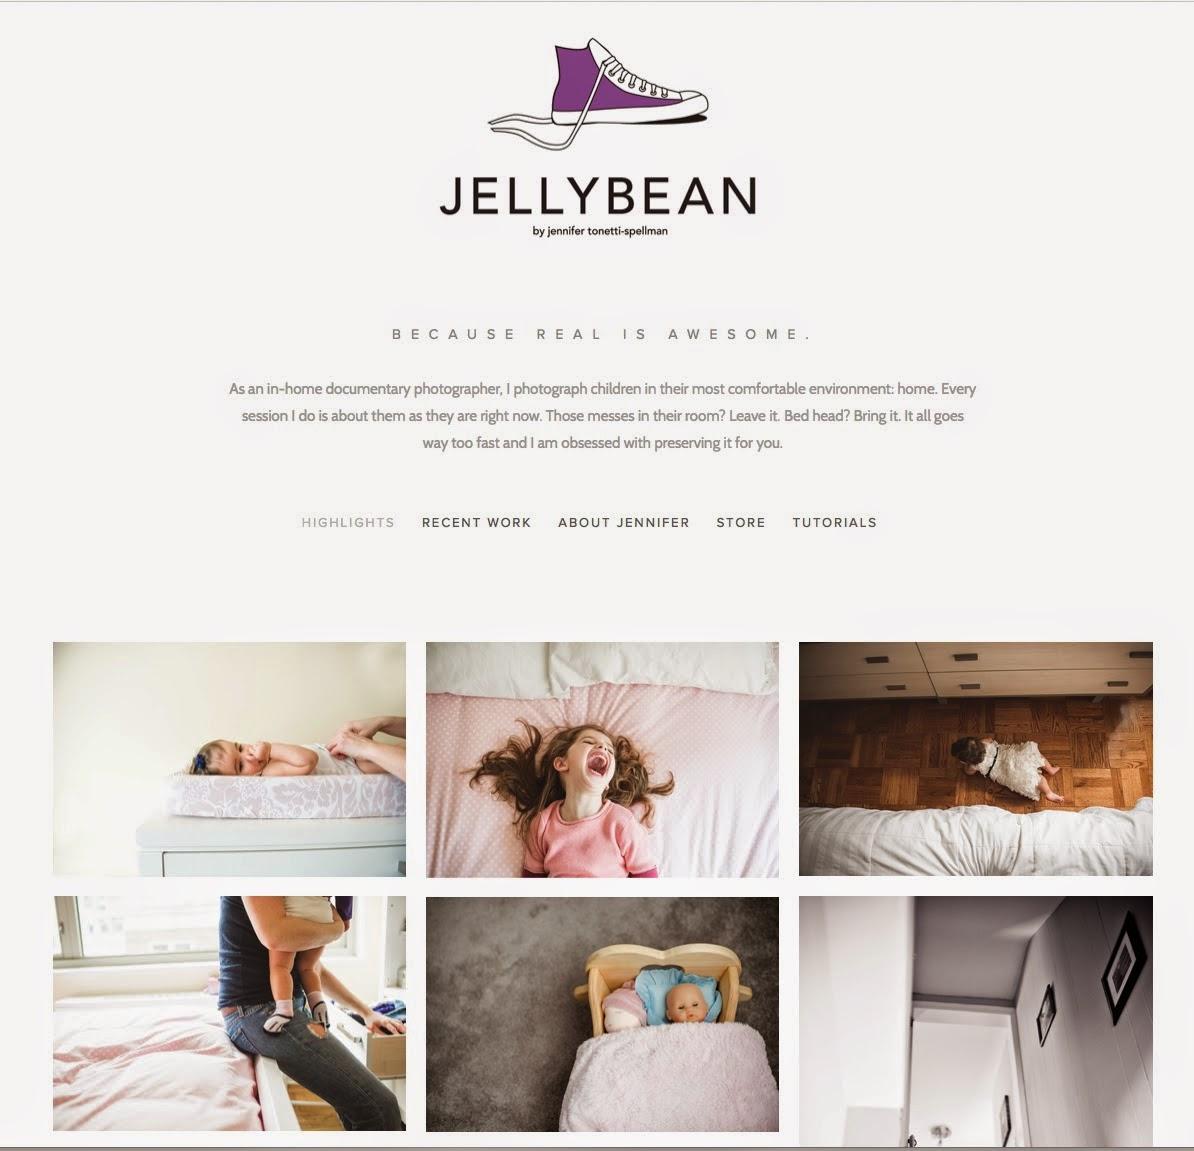 http://www.jellybeanblog.com/